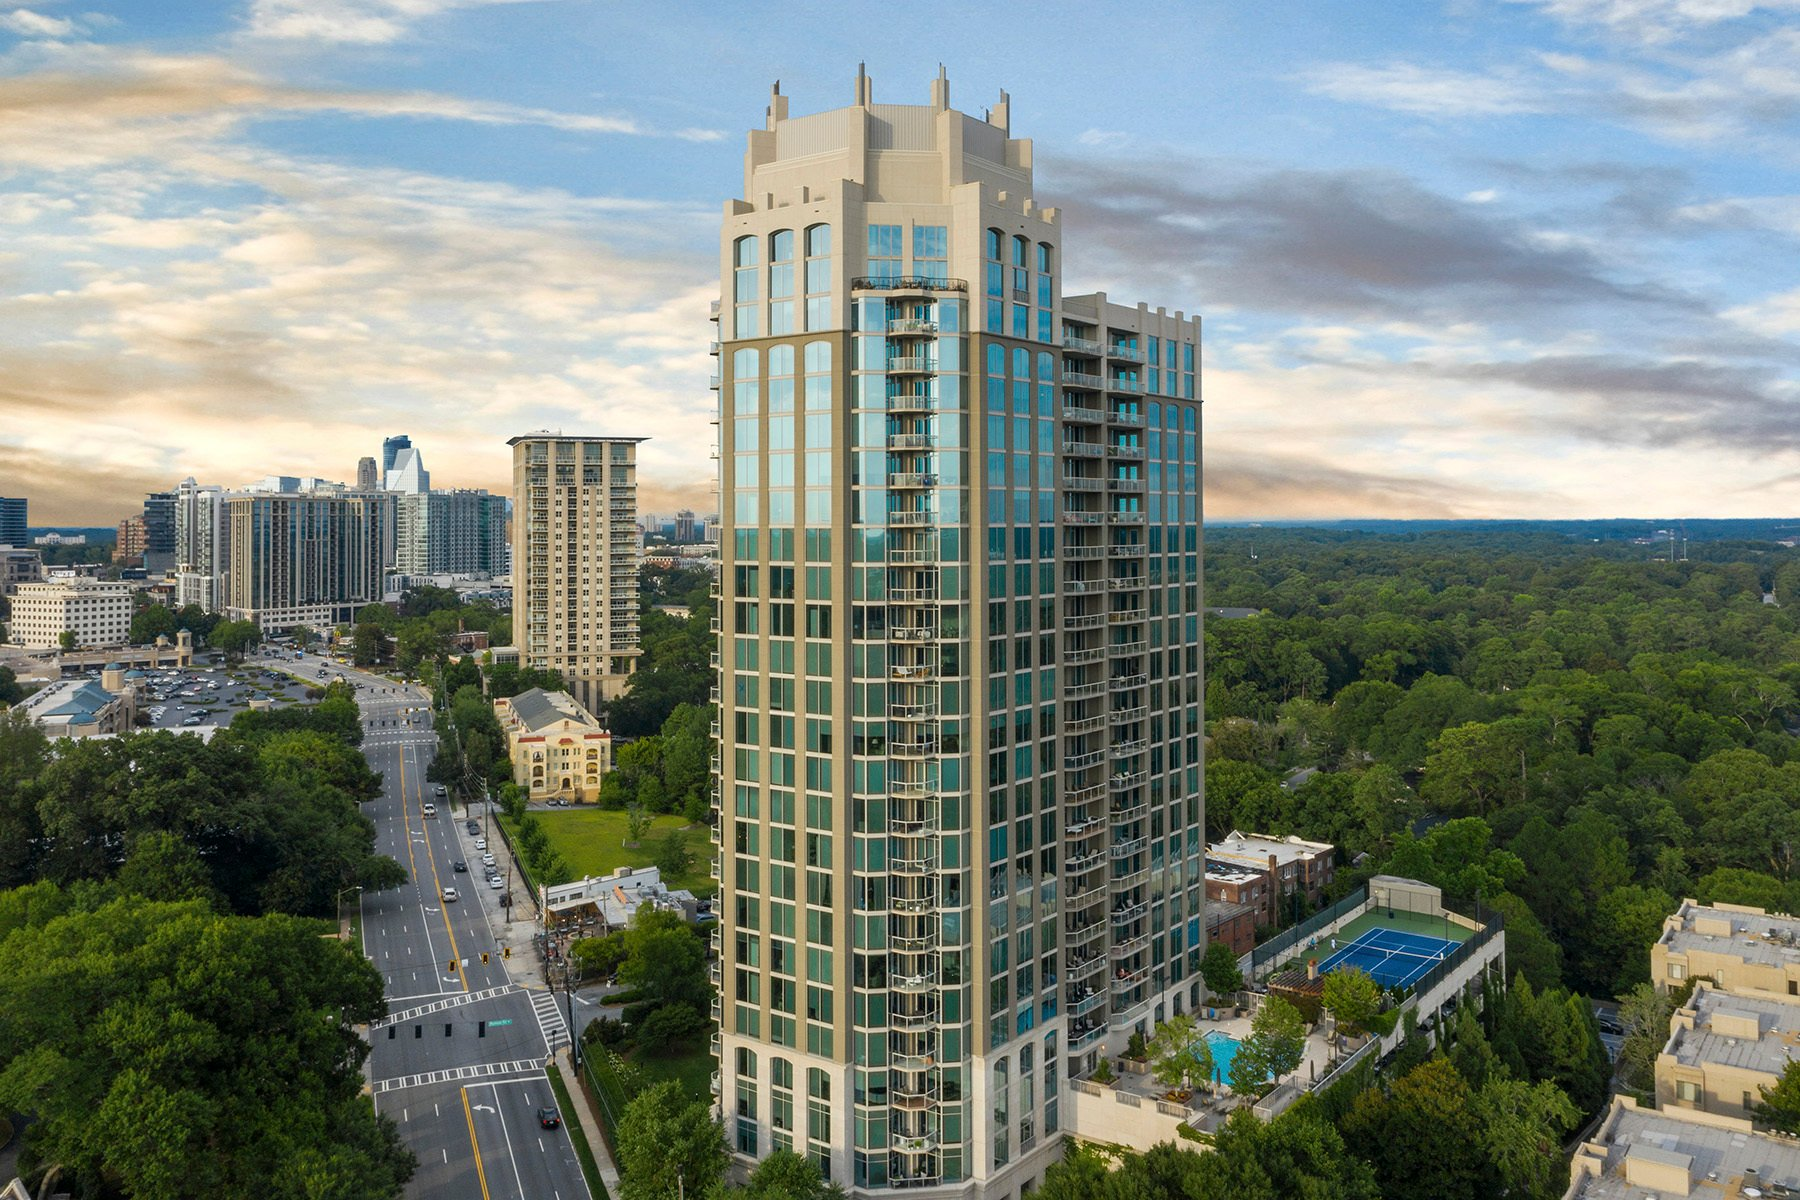 Condo in Atlanta, Georgia, United States 1 - 11389394